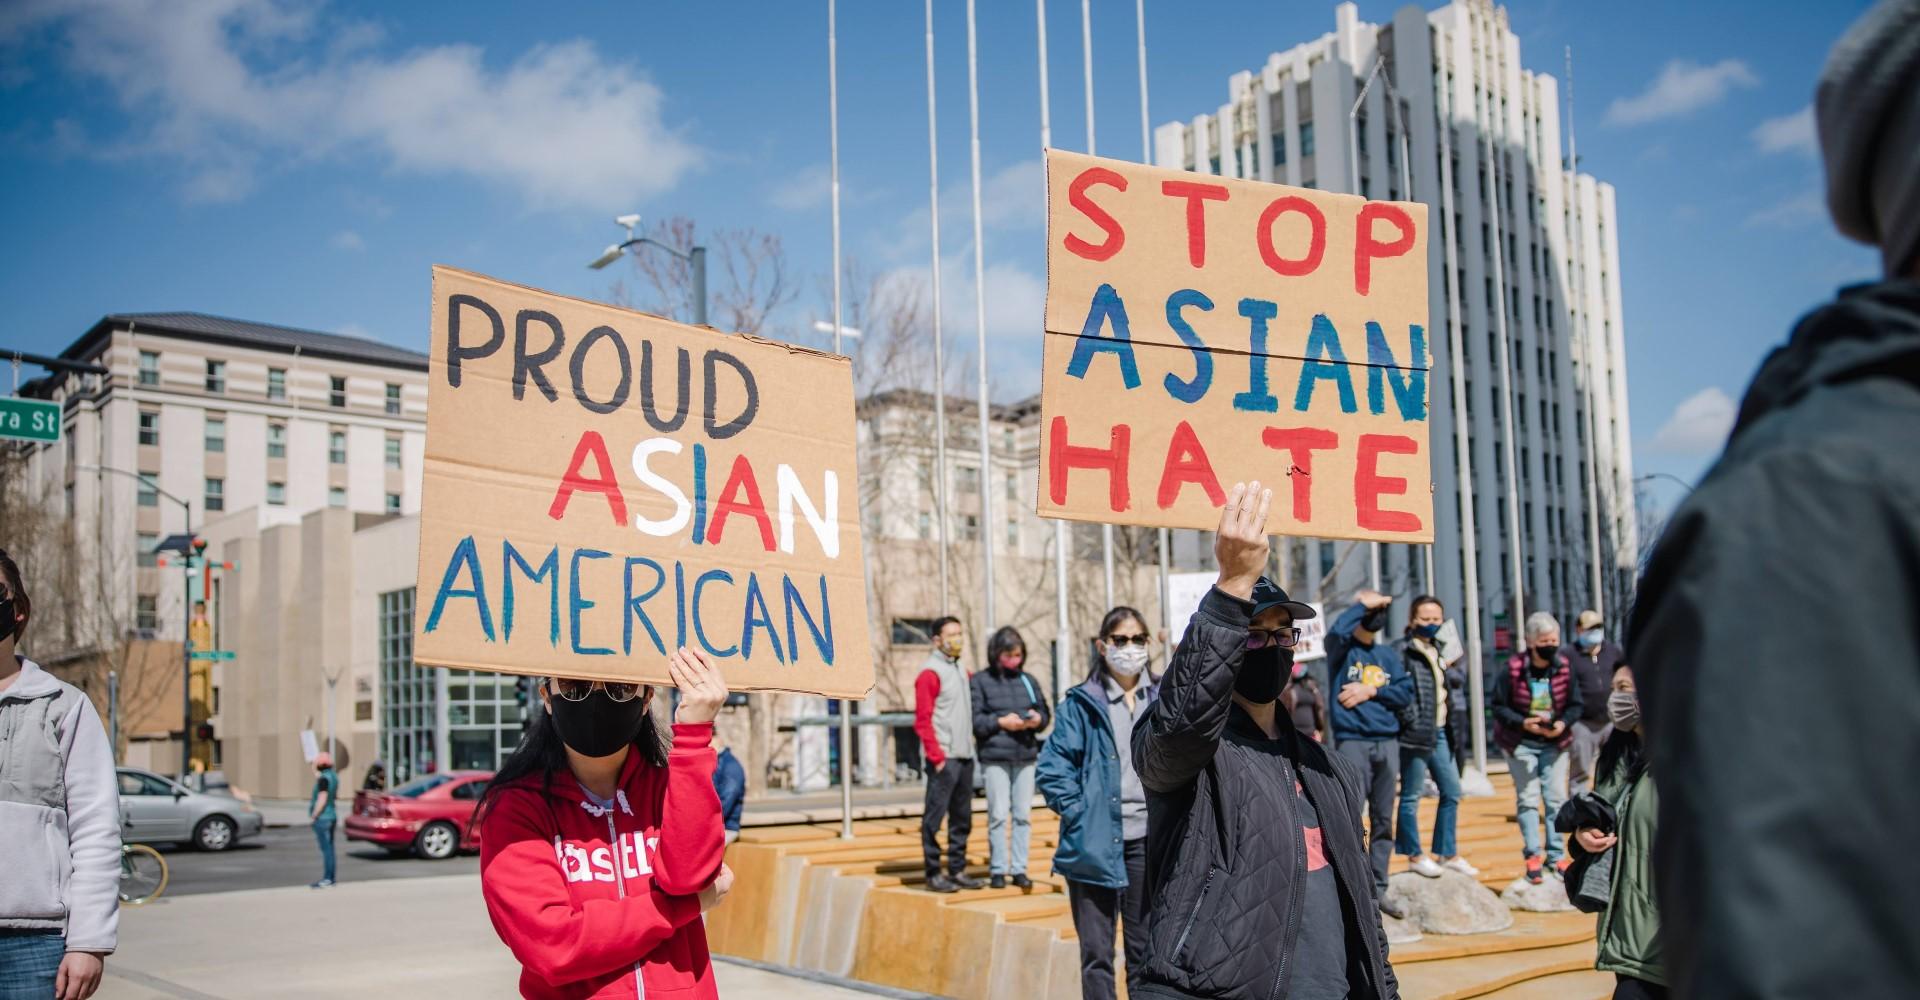 How Do We Convert Hurt to Healing? My Response to AAPI Hate